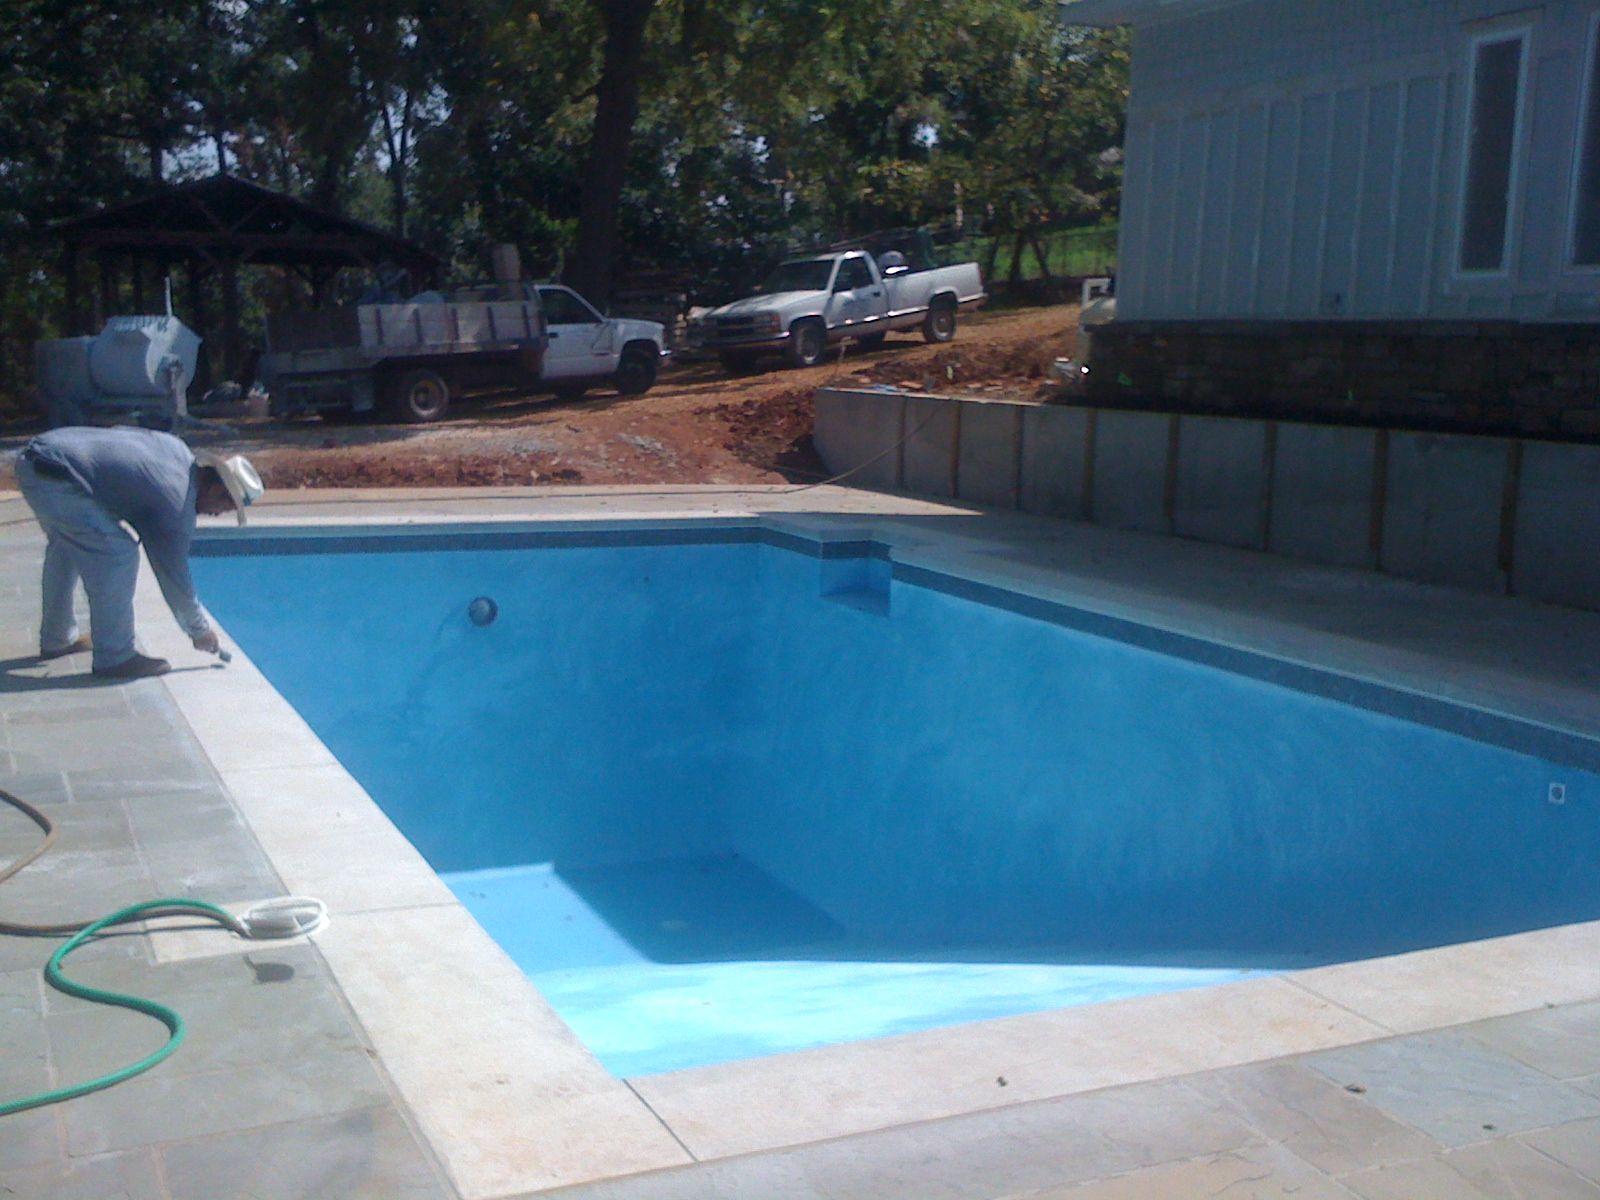 Pool Painted Diamond Brite Tahoe Blue Pool Colors Pool Paint Pool Designs